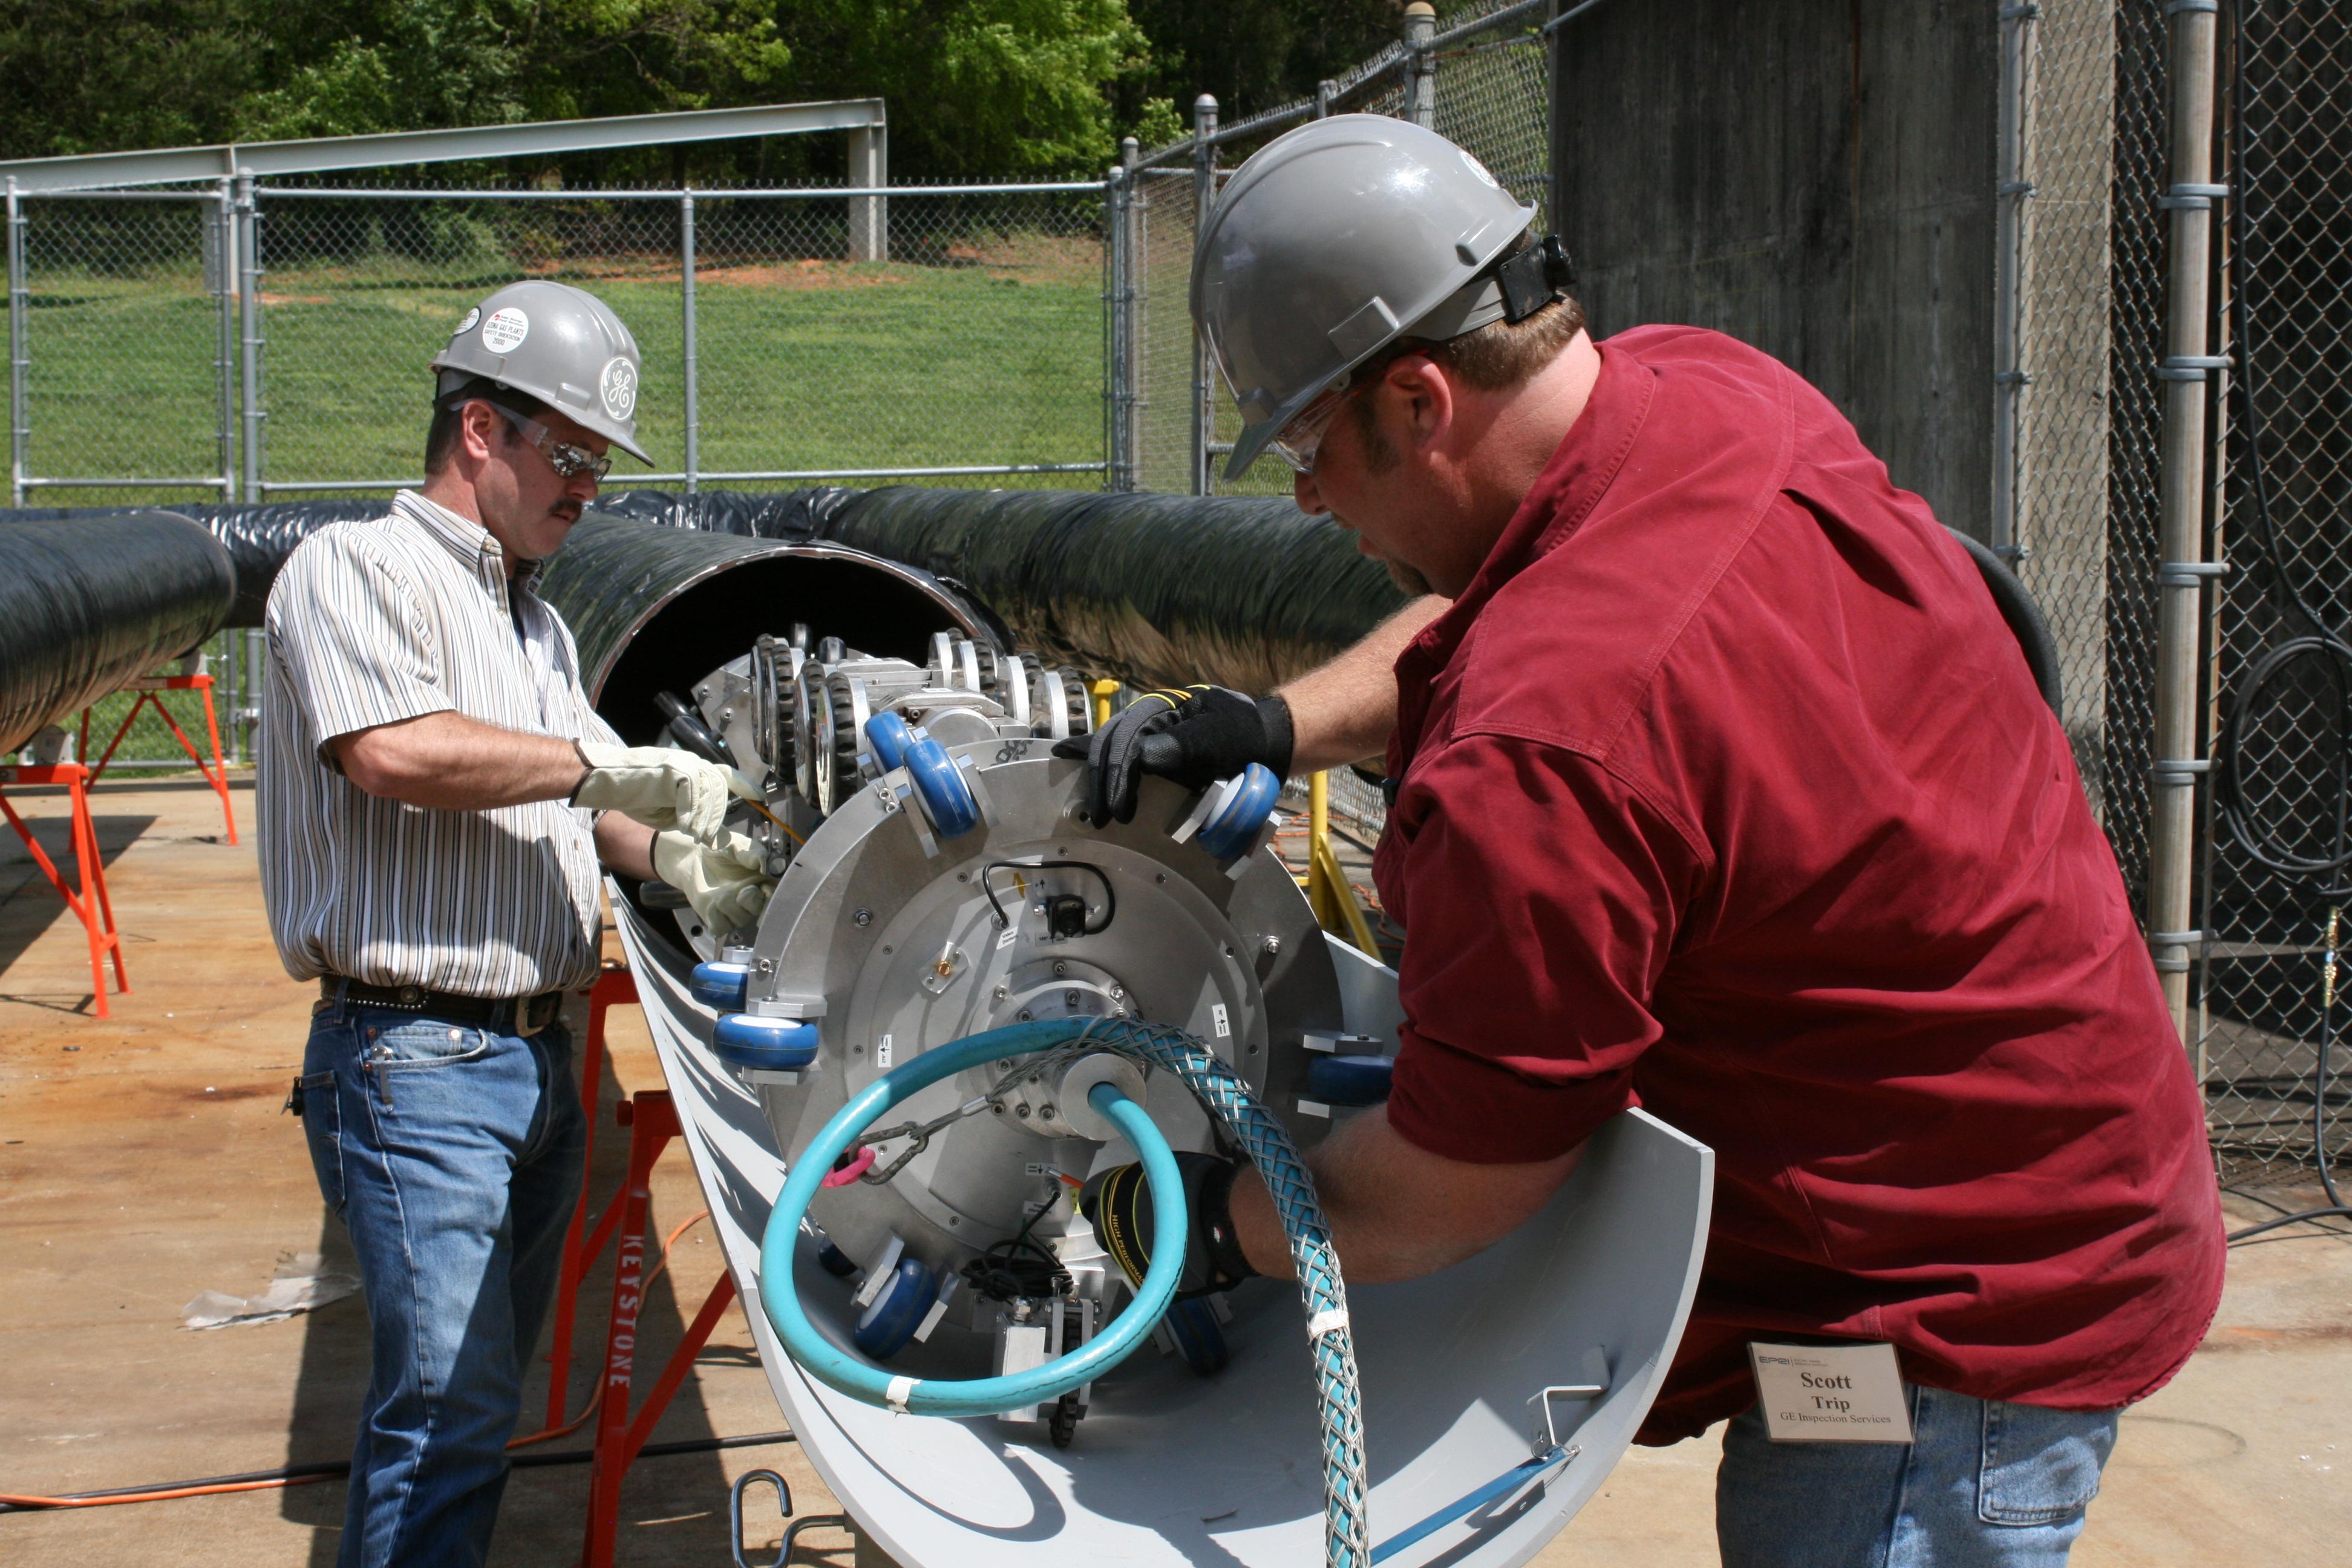 Internal Robotic Inspection Tool for Unpiggable Pipe Inspections